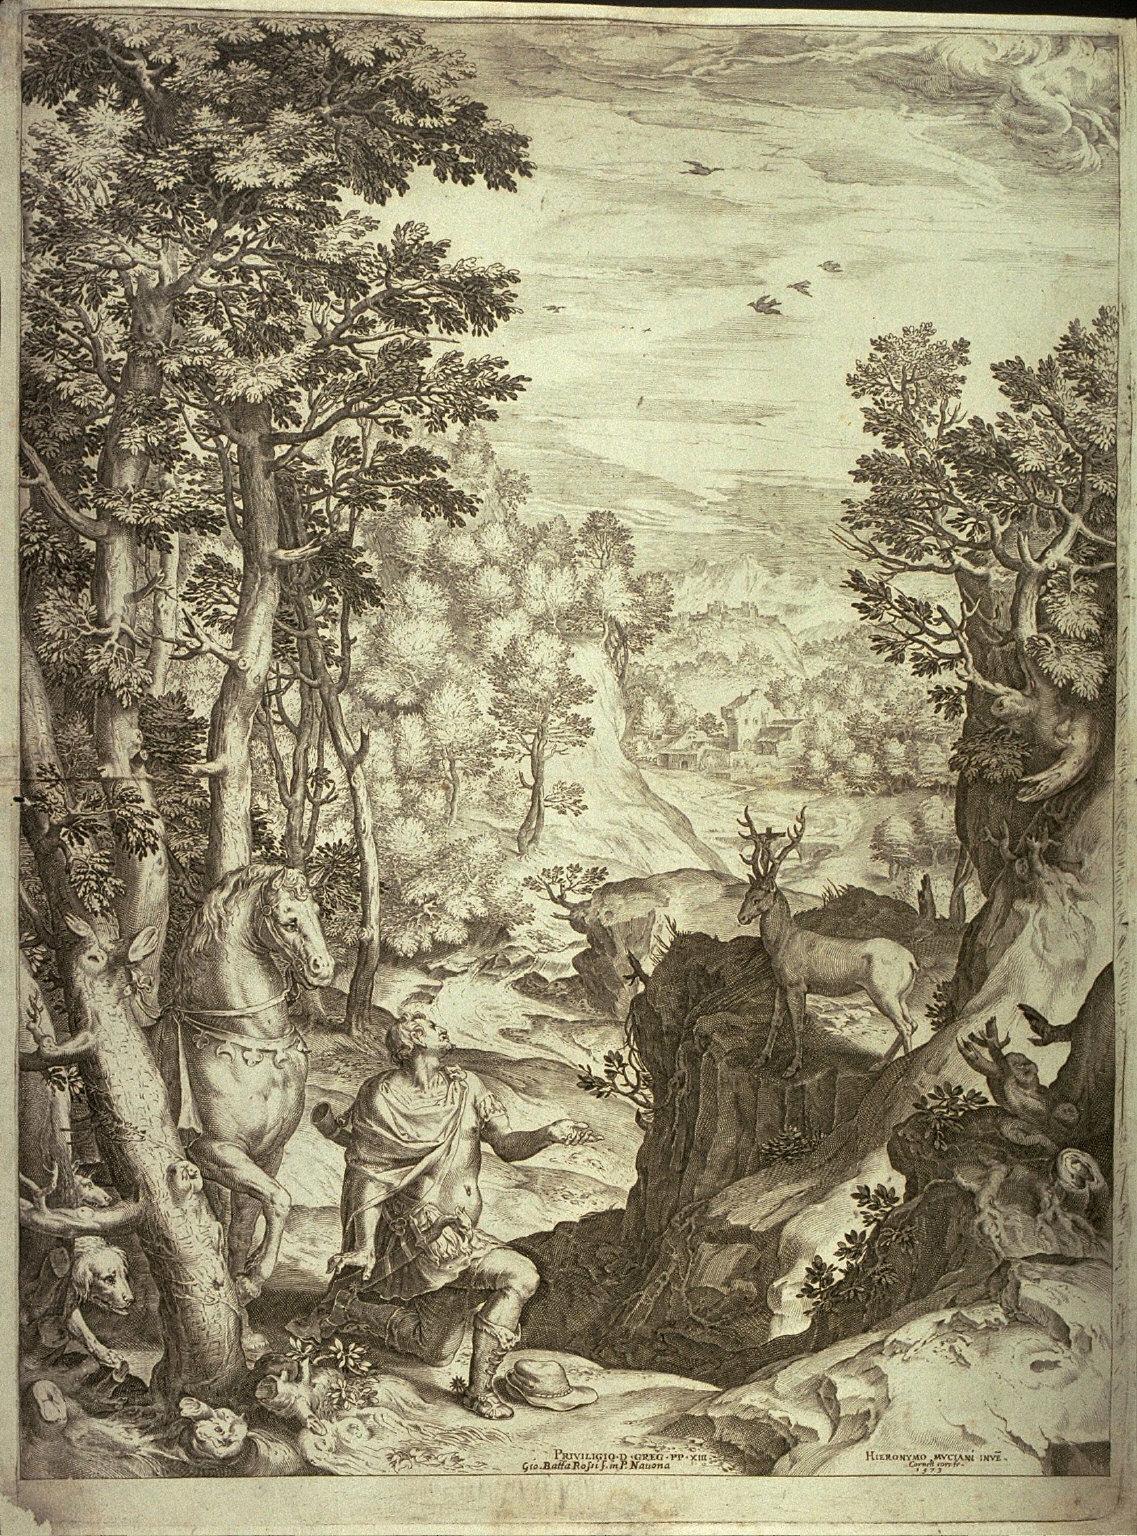 St. Hubert in a large landscape